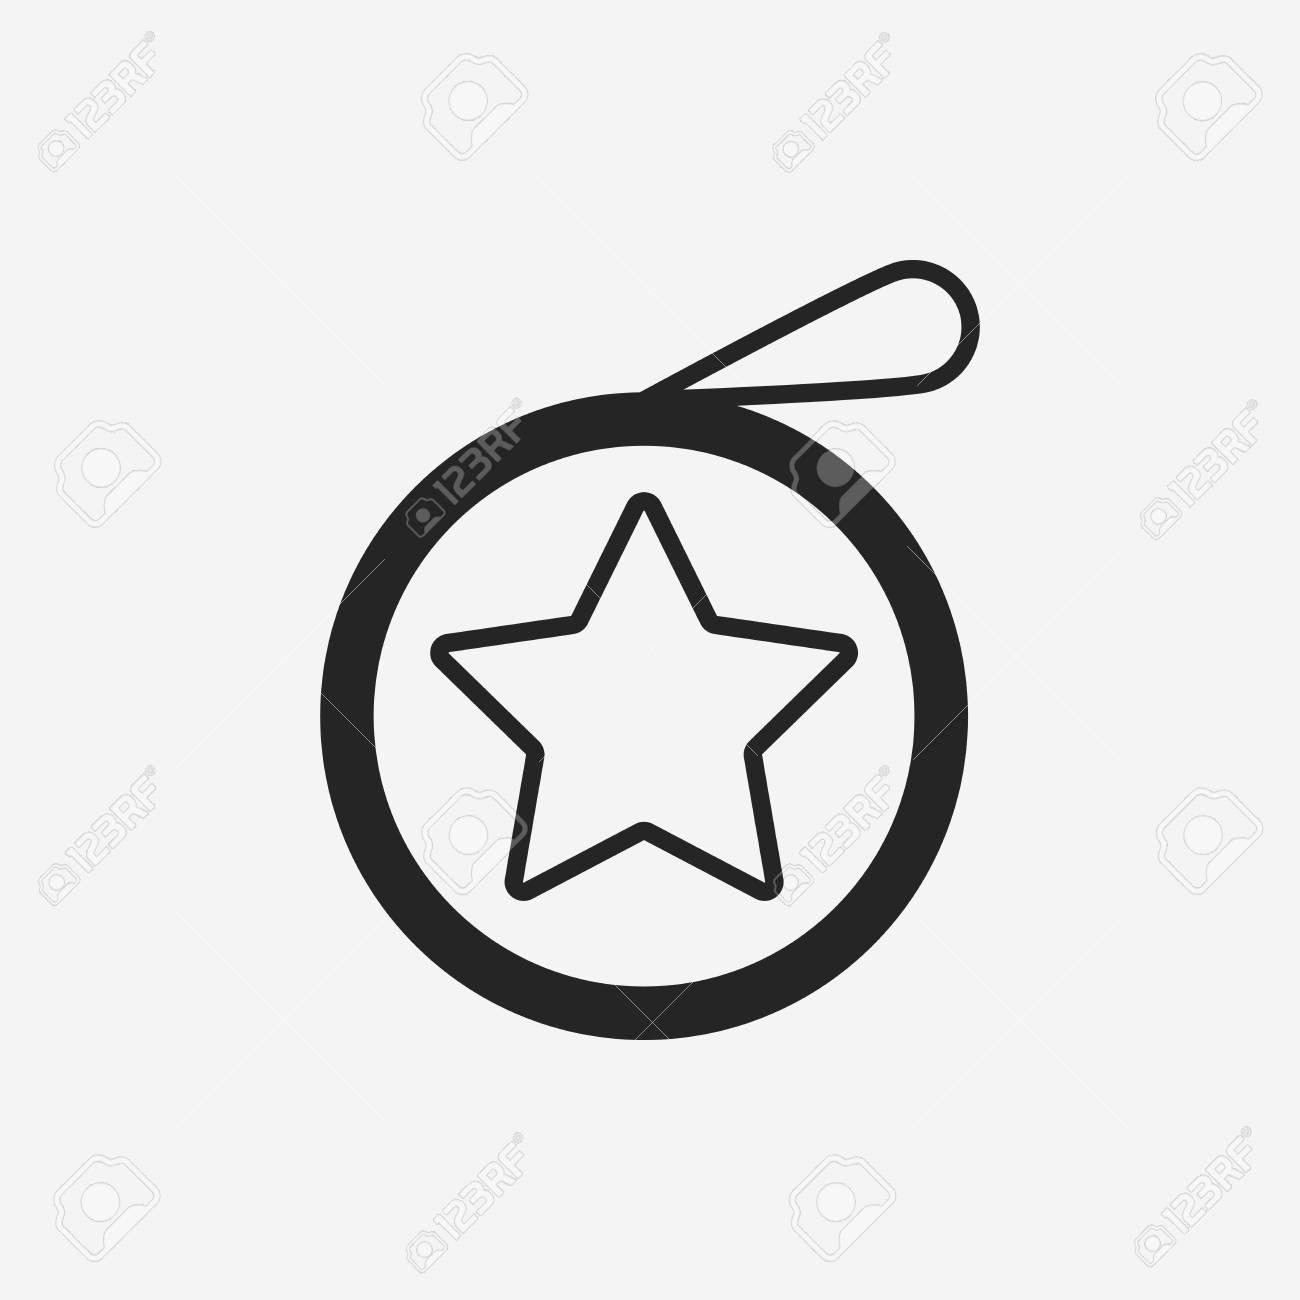 Toy yo yo icon royalty free cliparts vectors and stock toy yo yo icon stock vector 41282254 buycottarizona Images